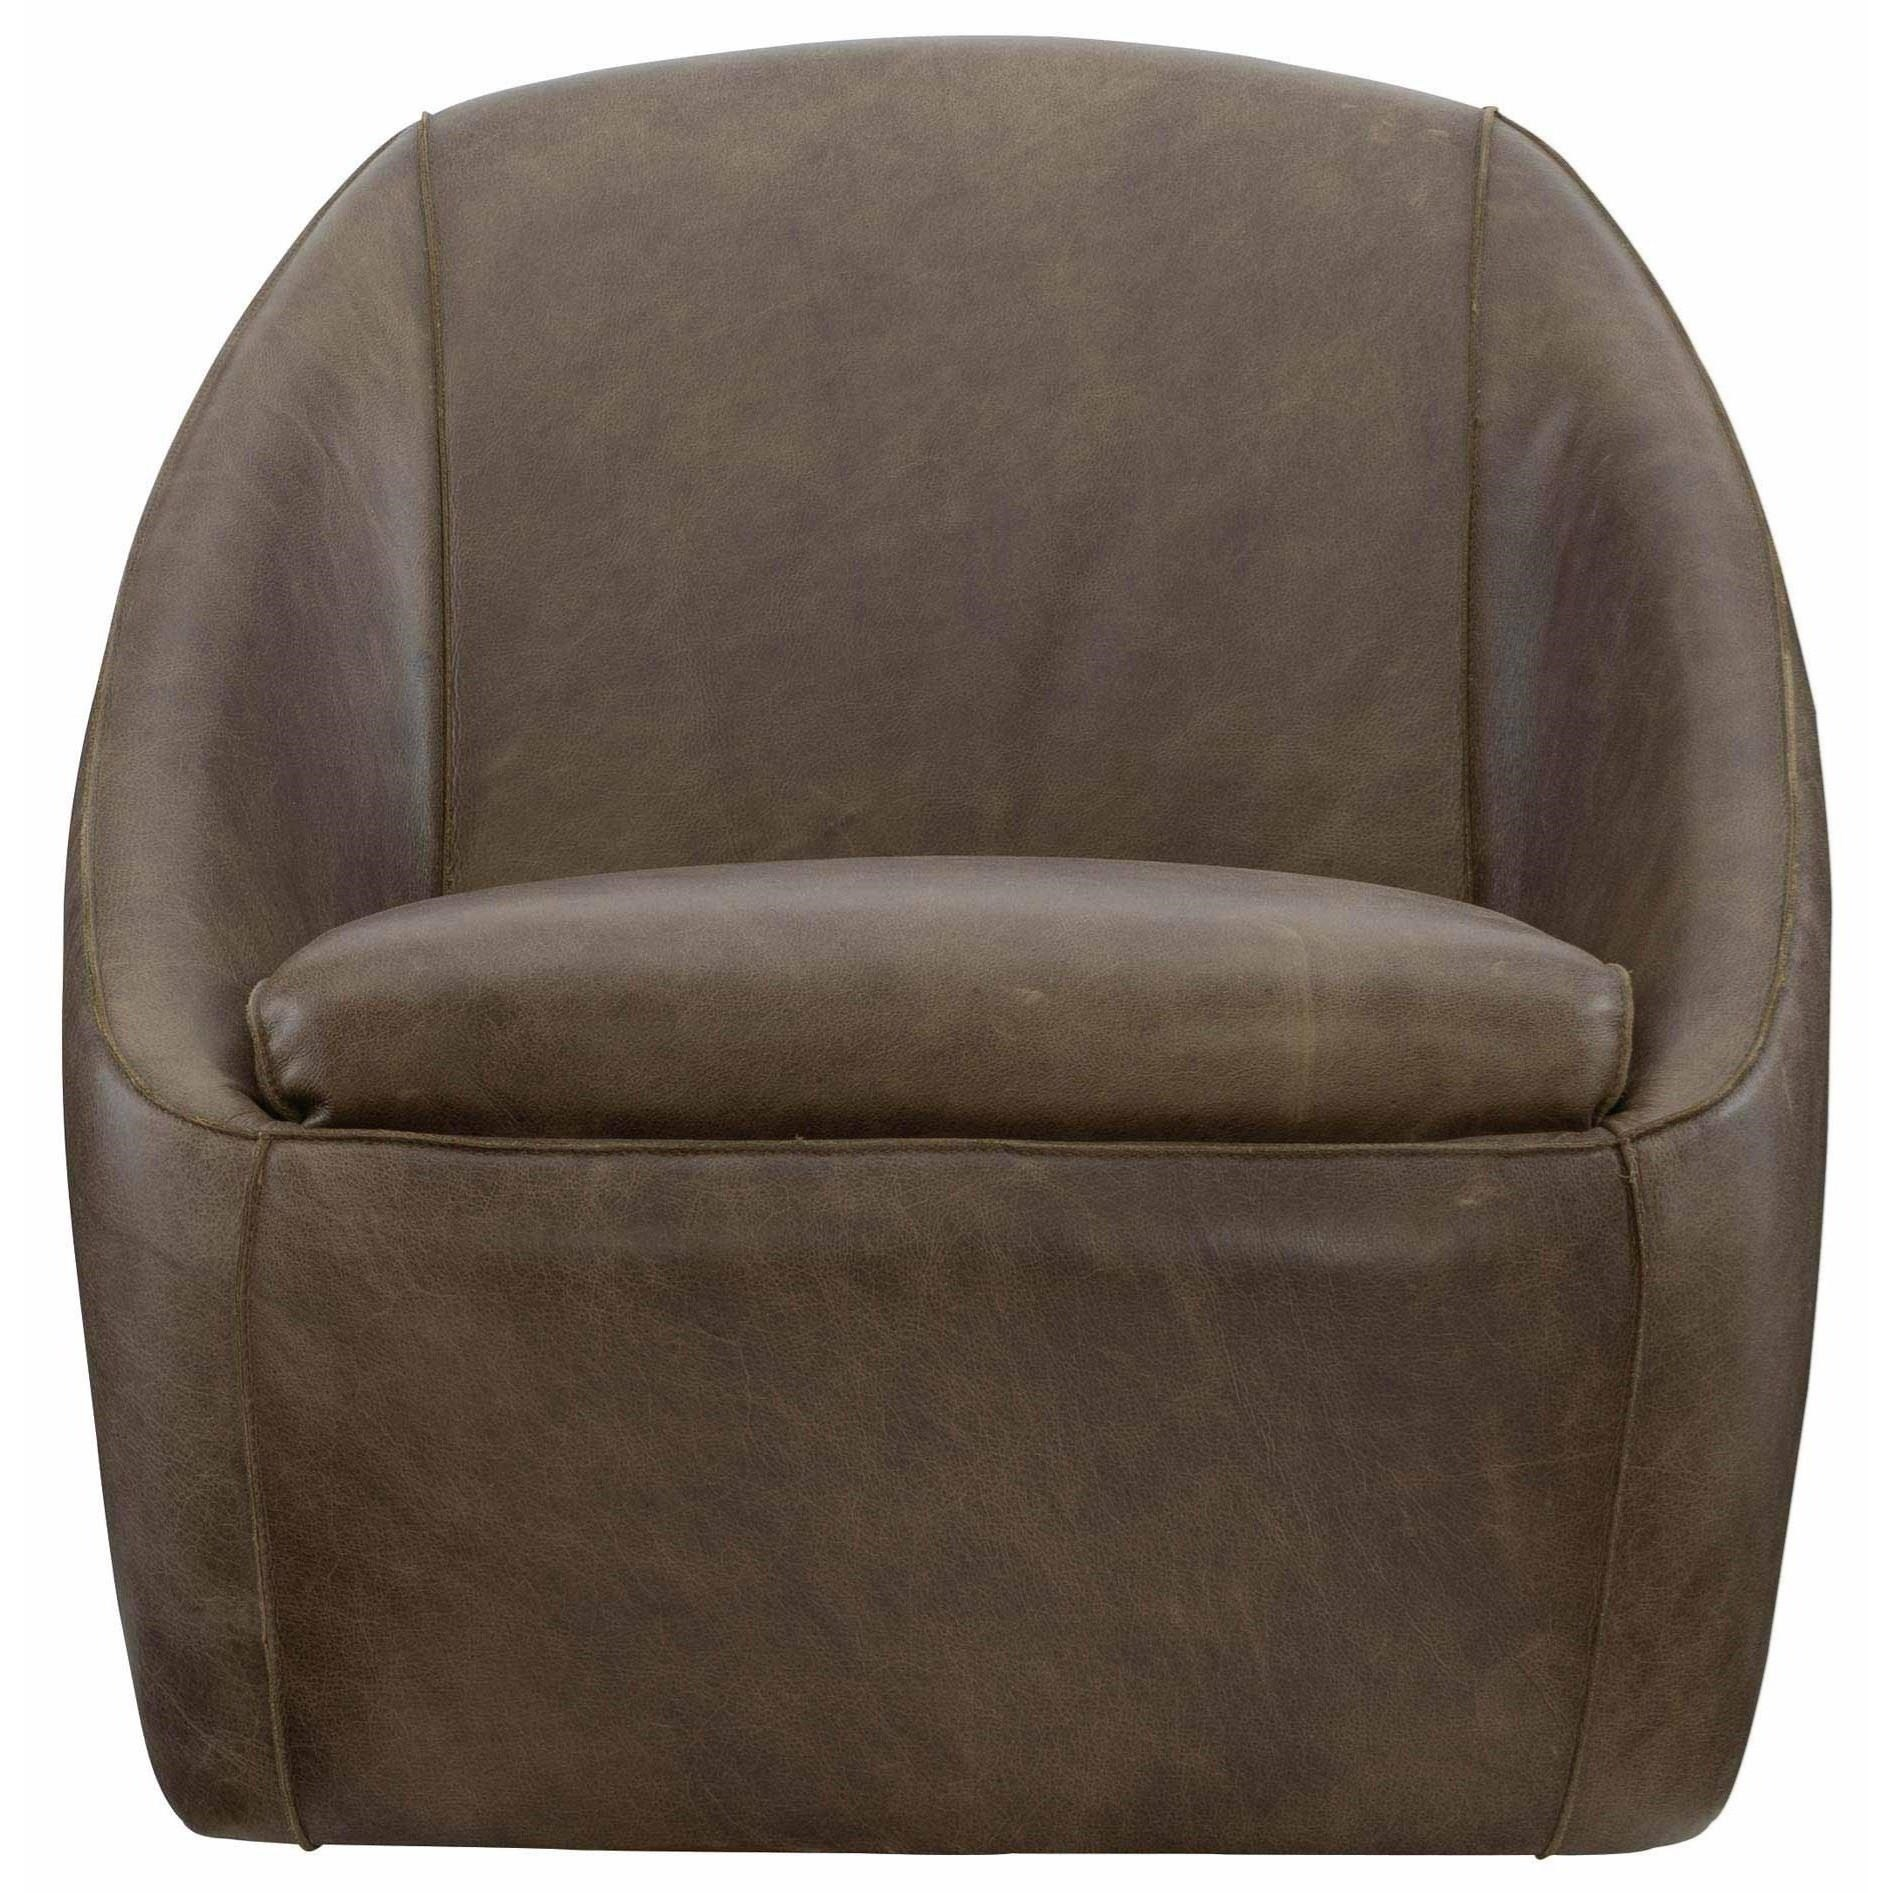 Loft - Highland Park Webster Swivel Chair at Williams & Kay